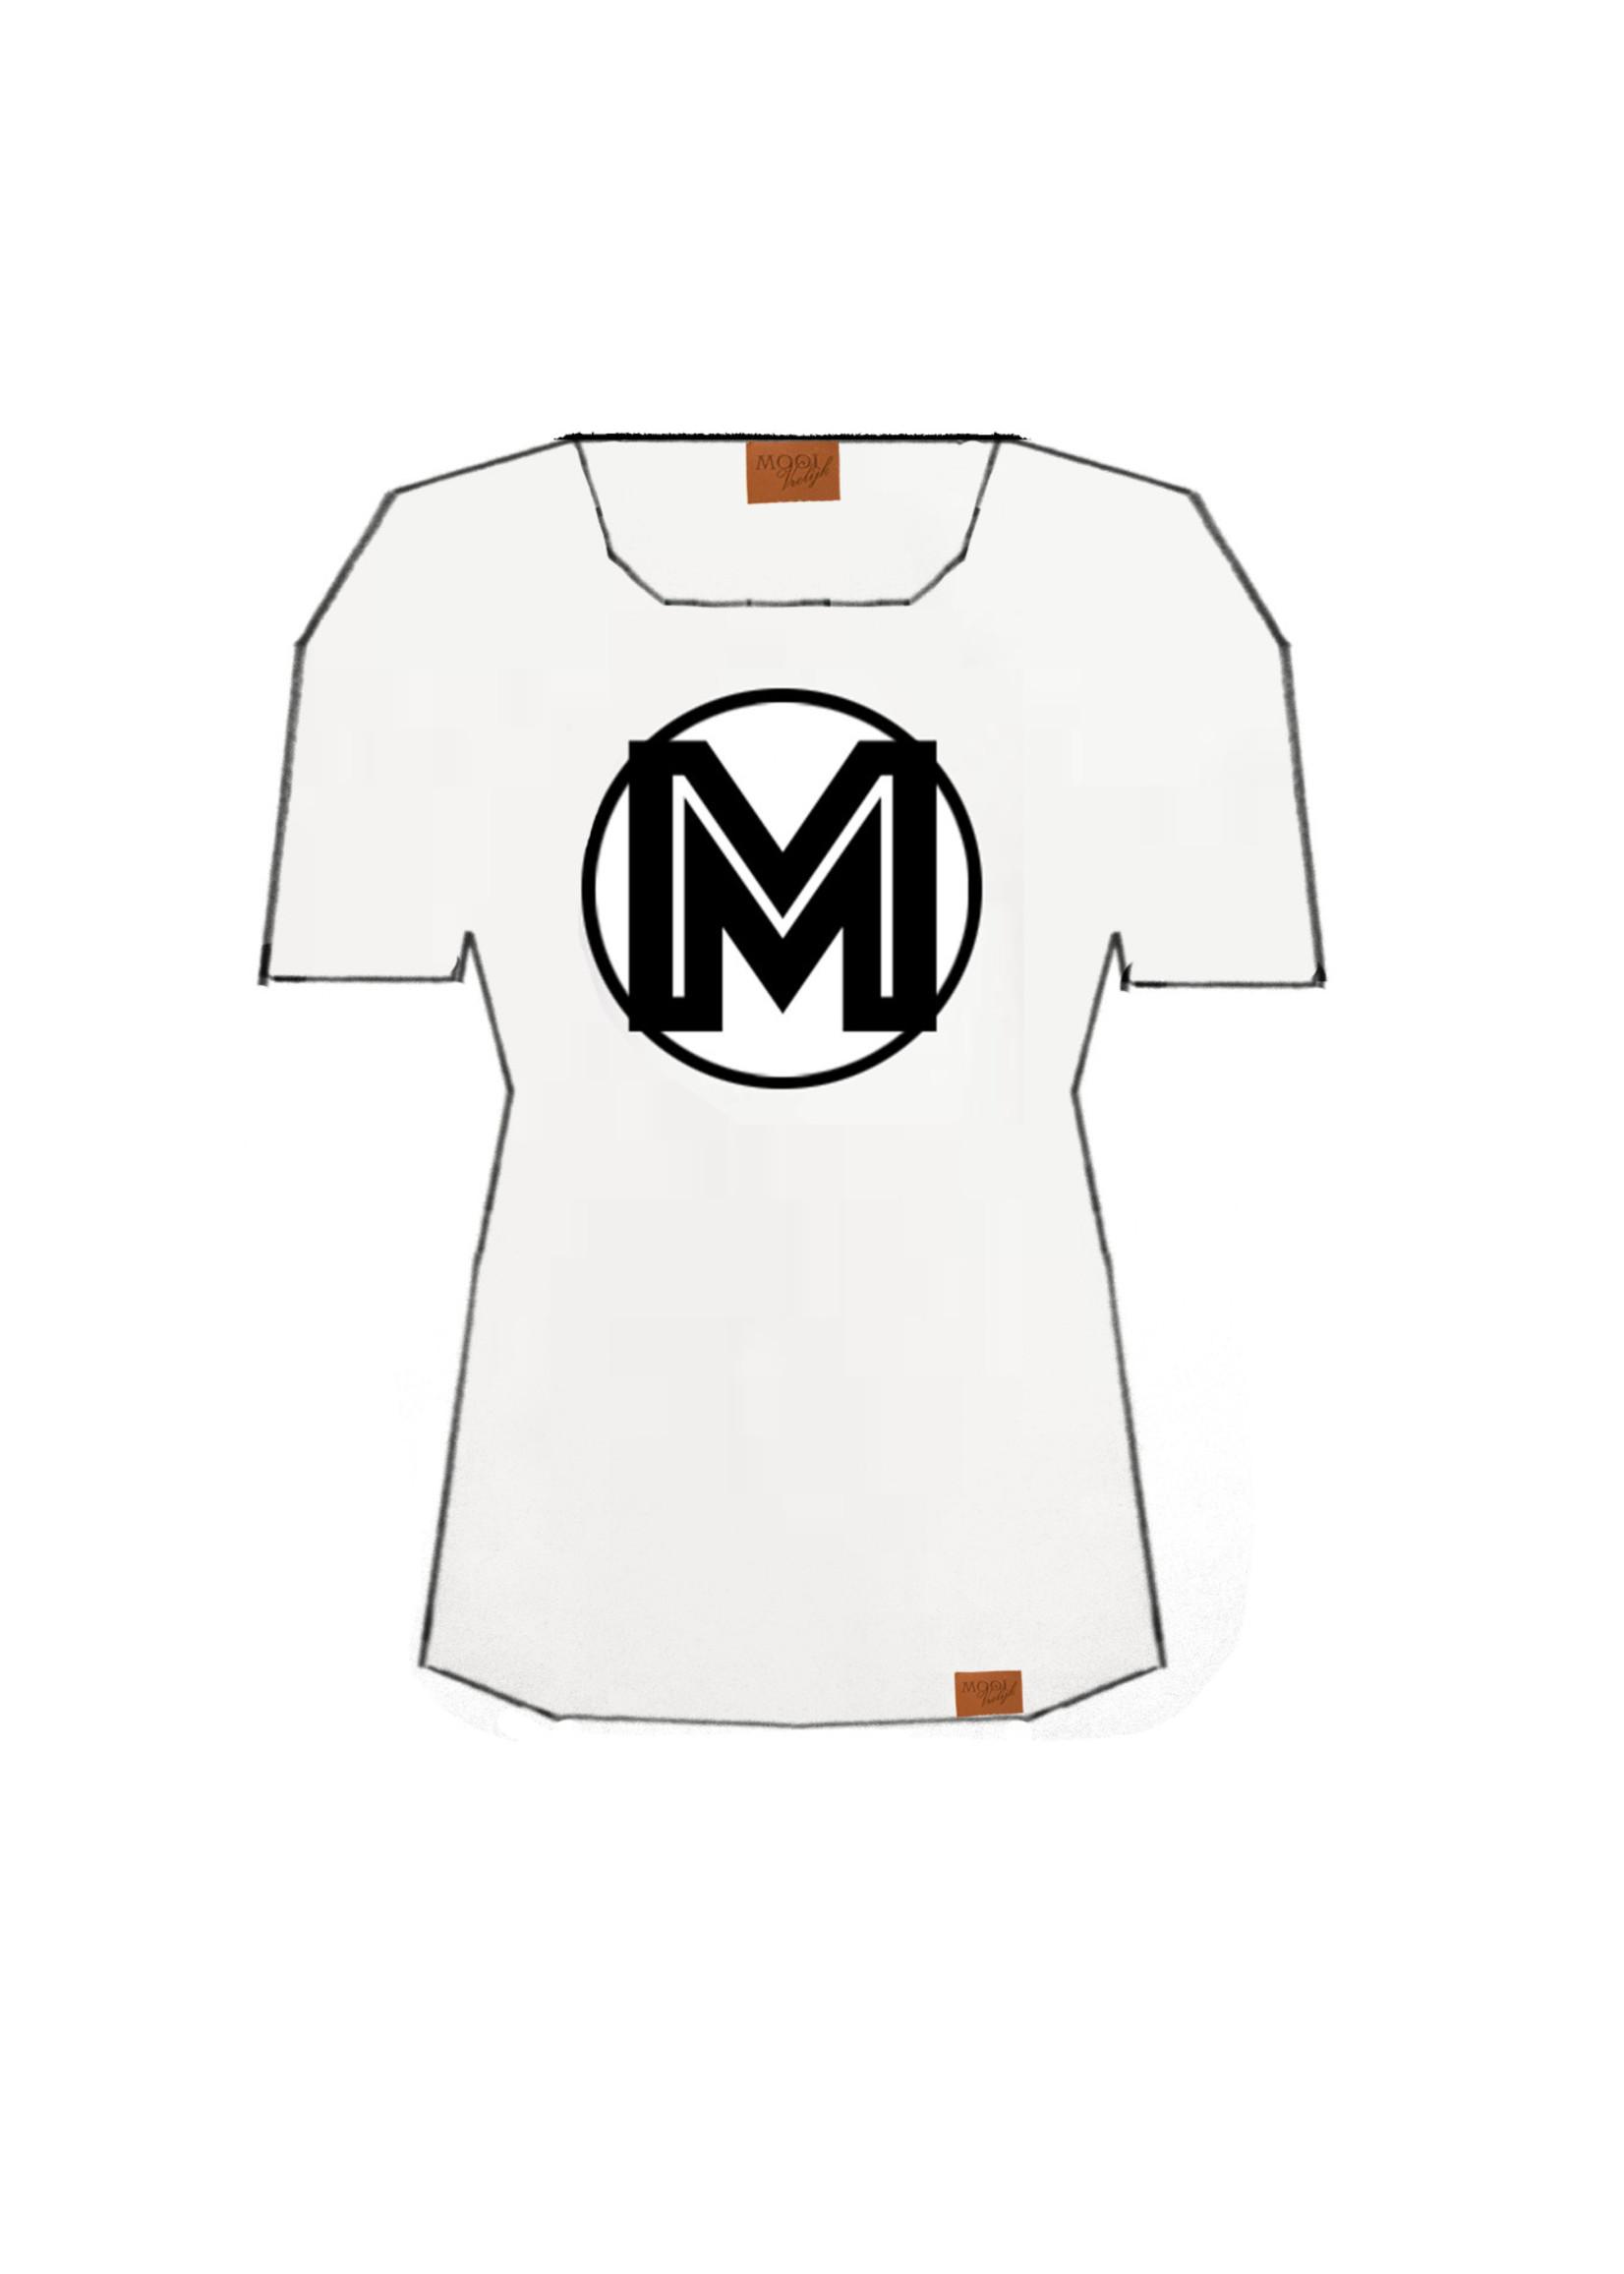 MOOI VROLIJK T-shirt White black M 21224